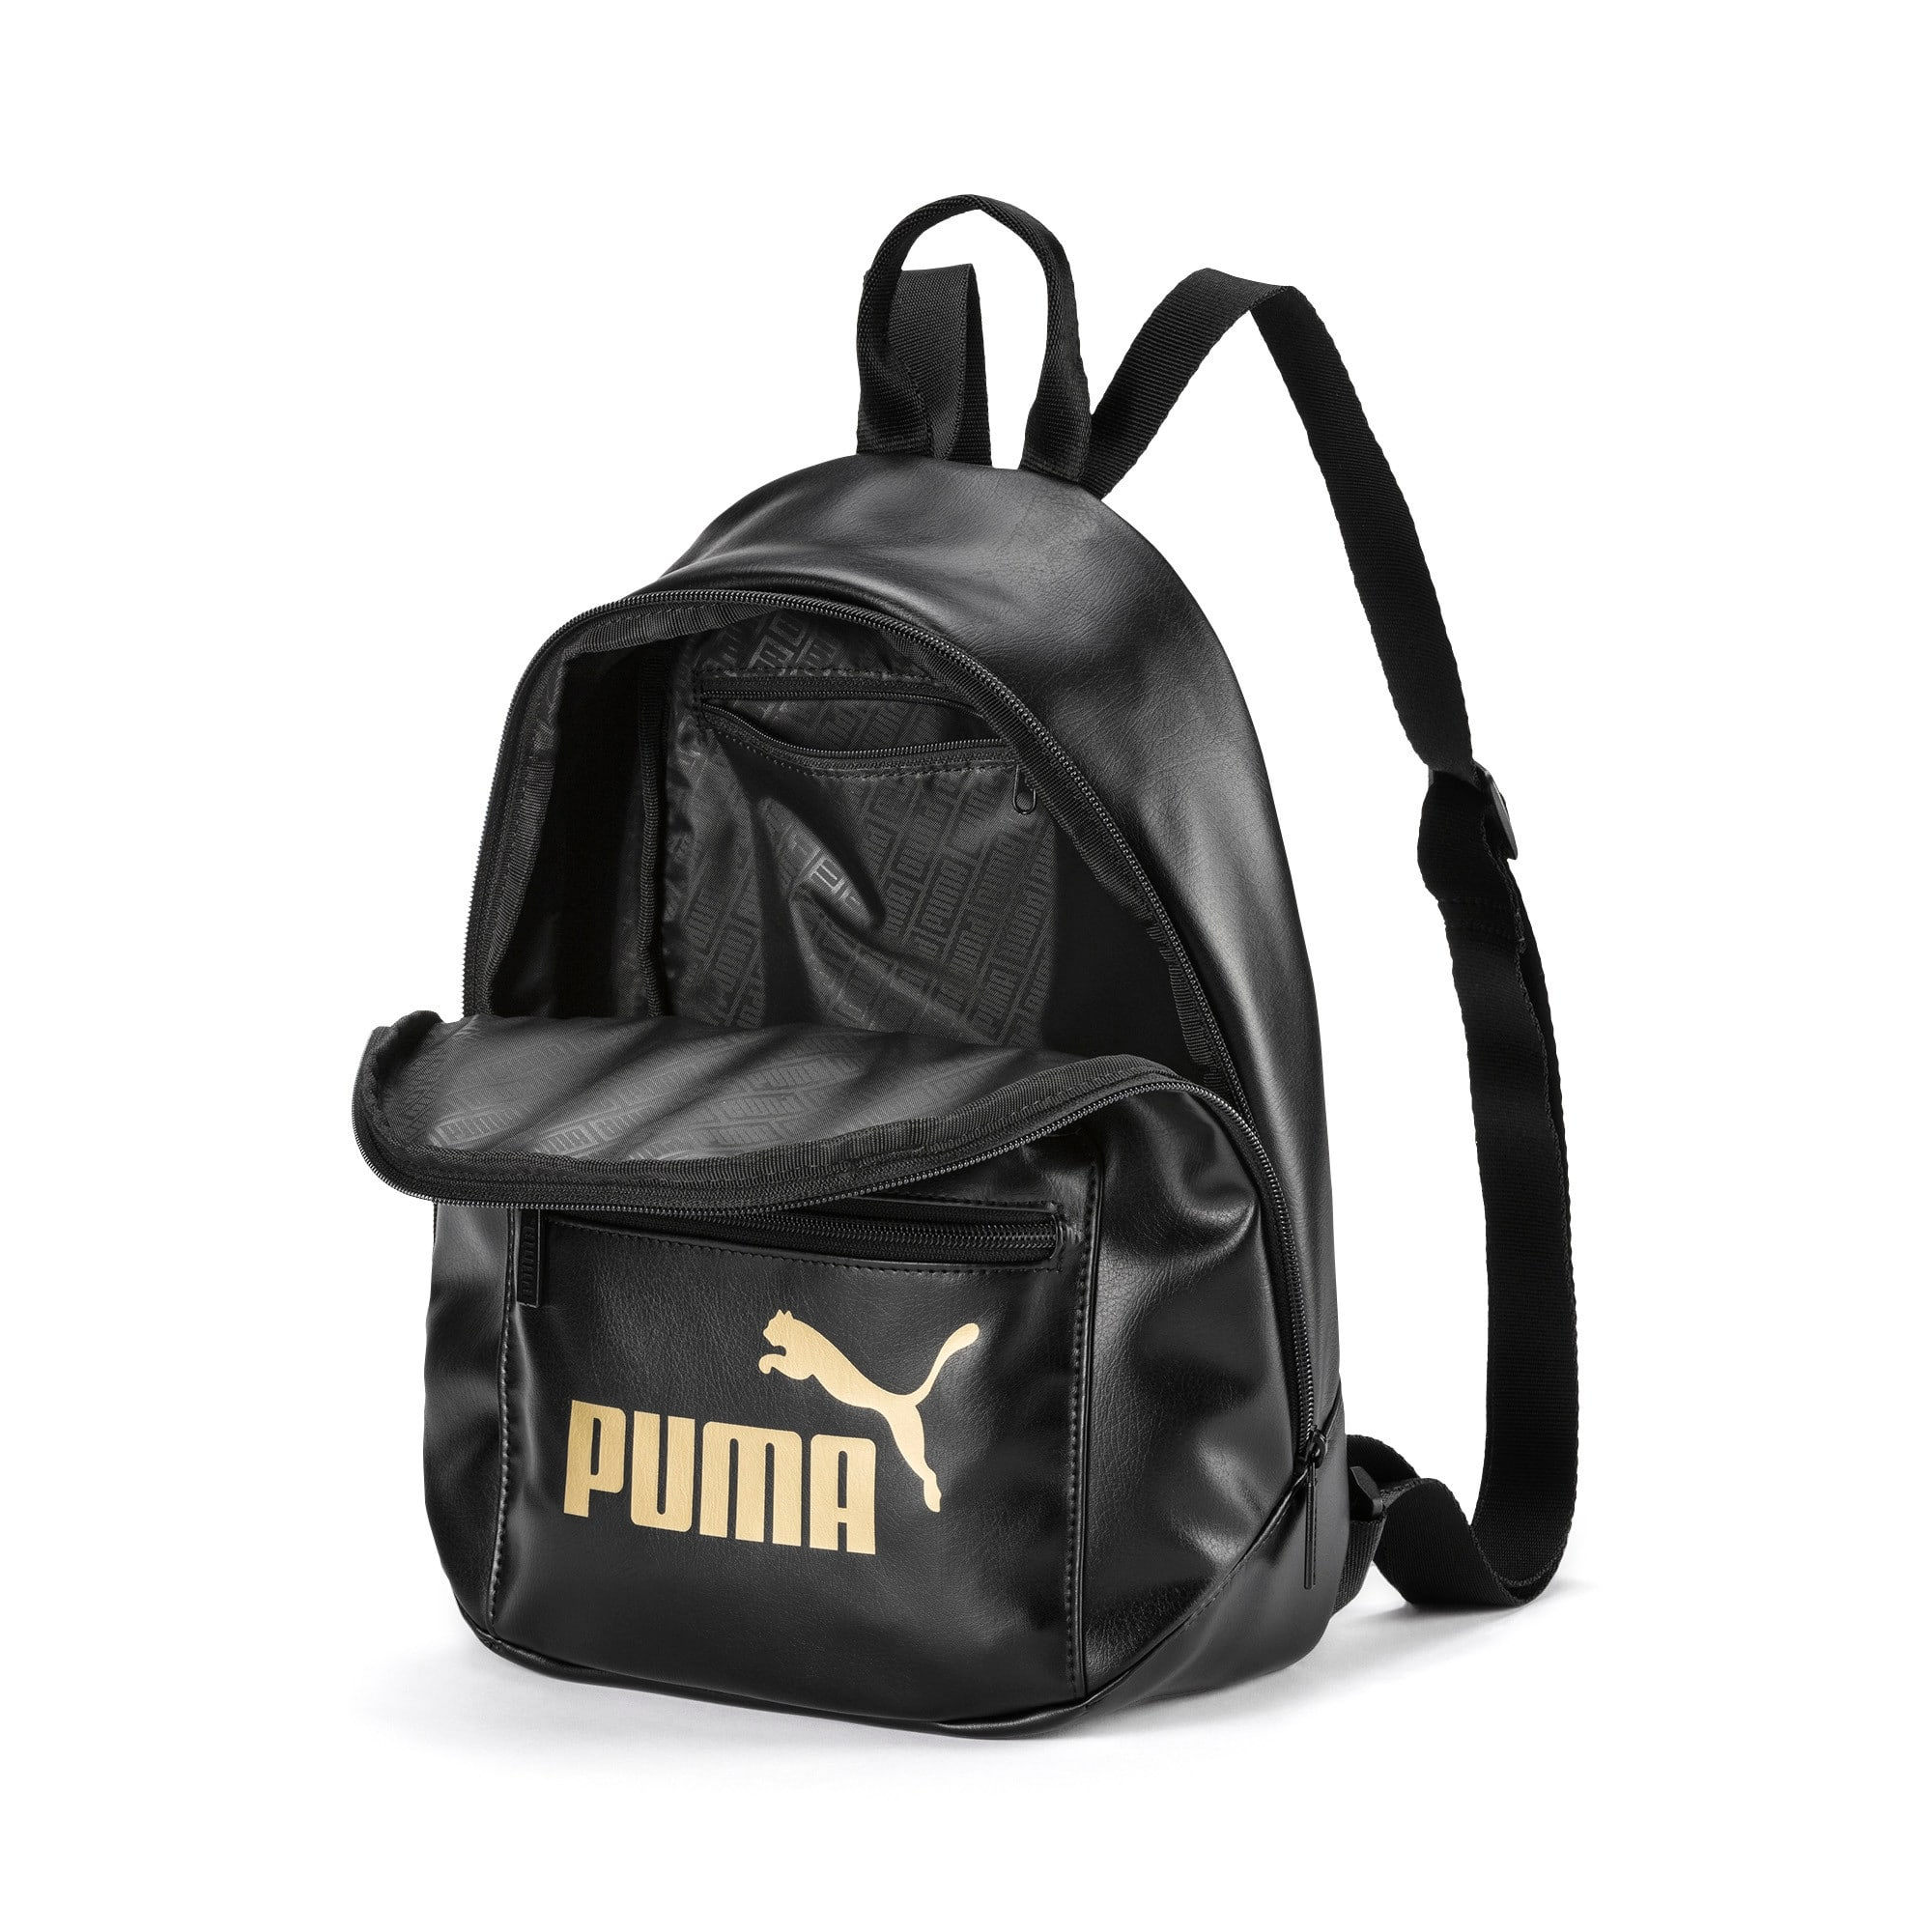 Thumbnail 4 of Up Women's Archive Backpack, Puma Black-Gold, medium